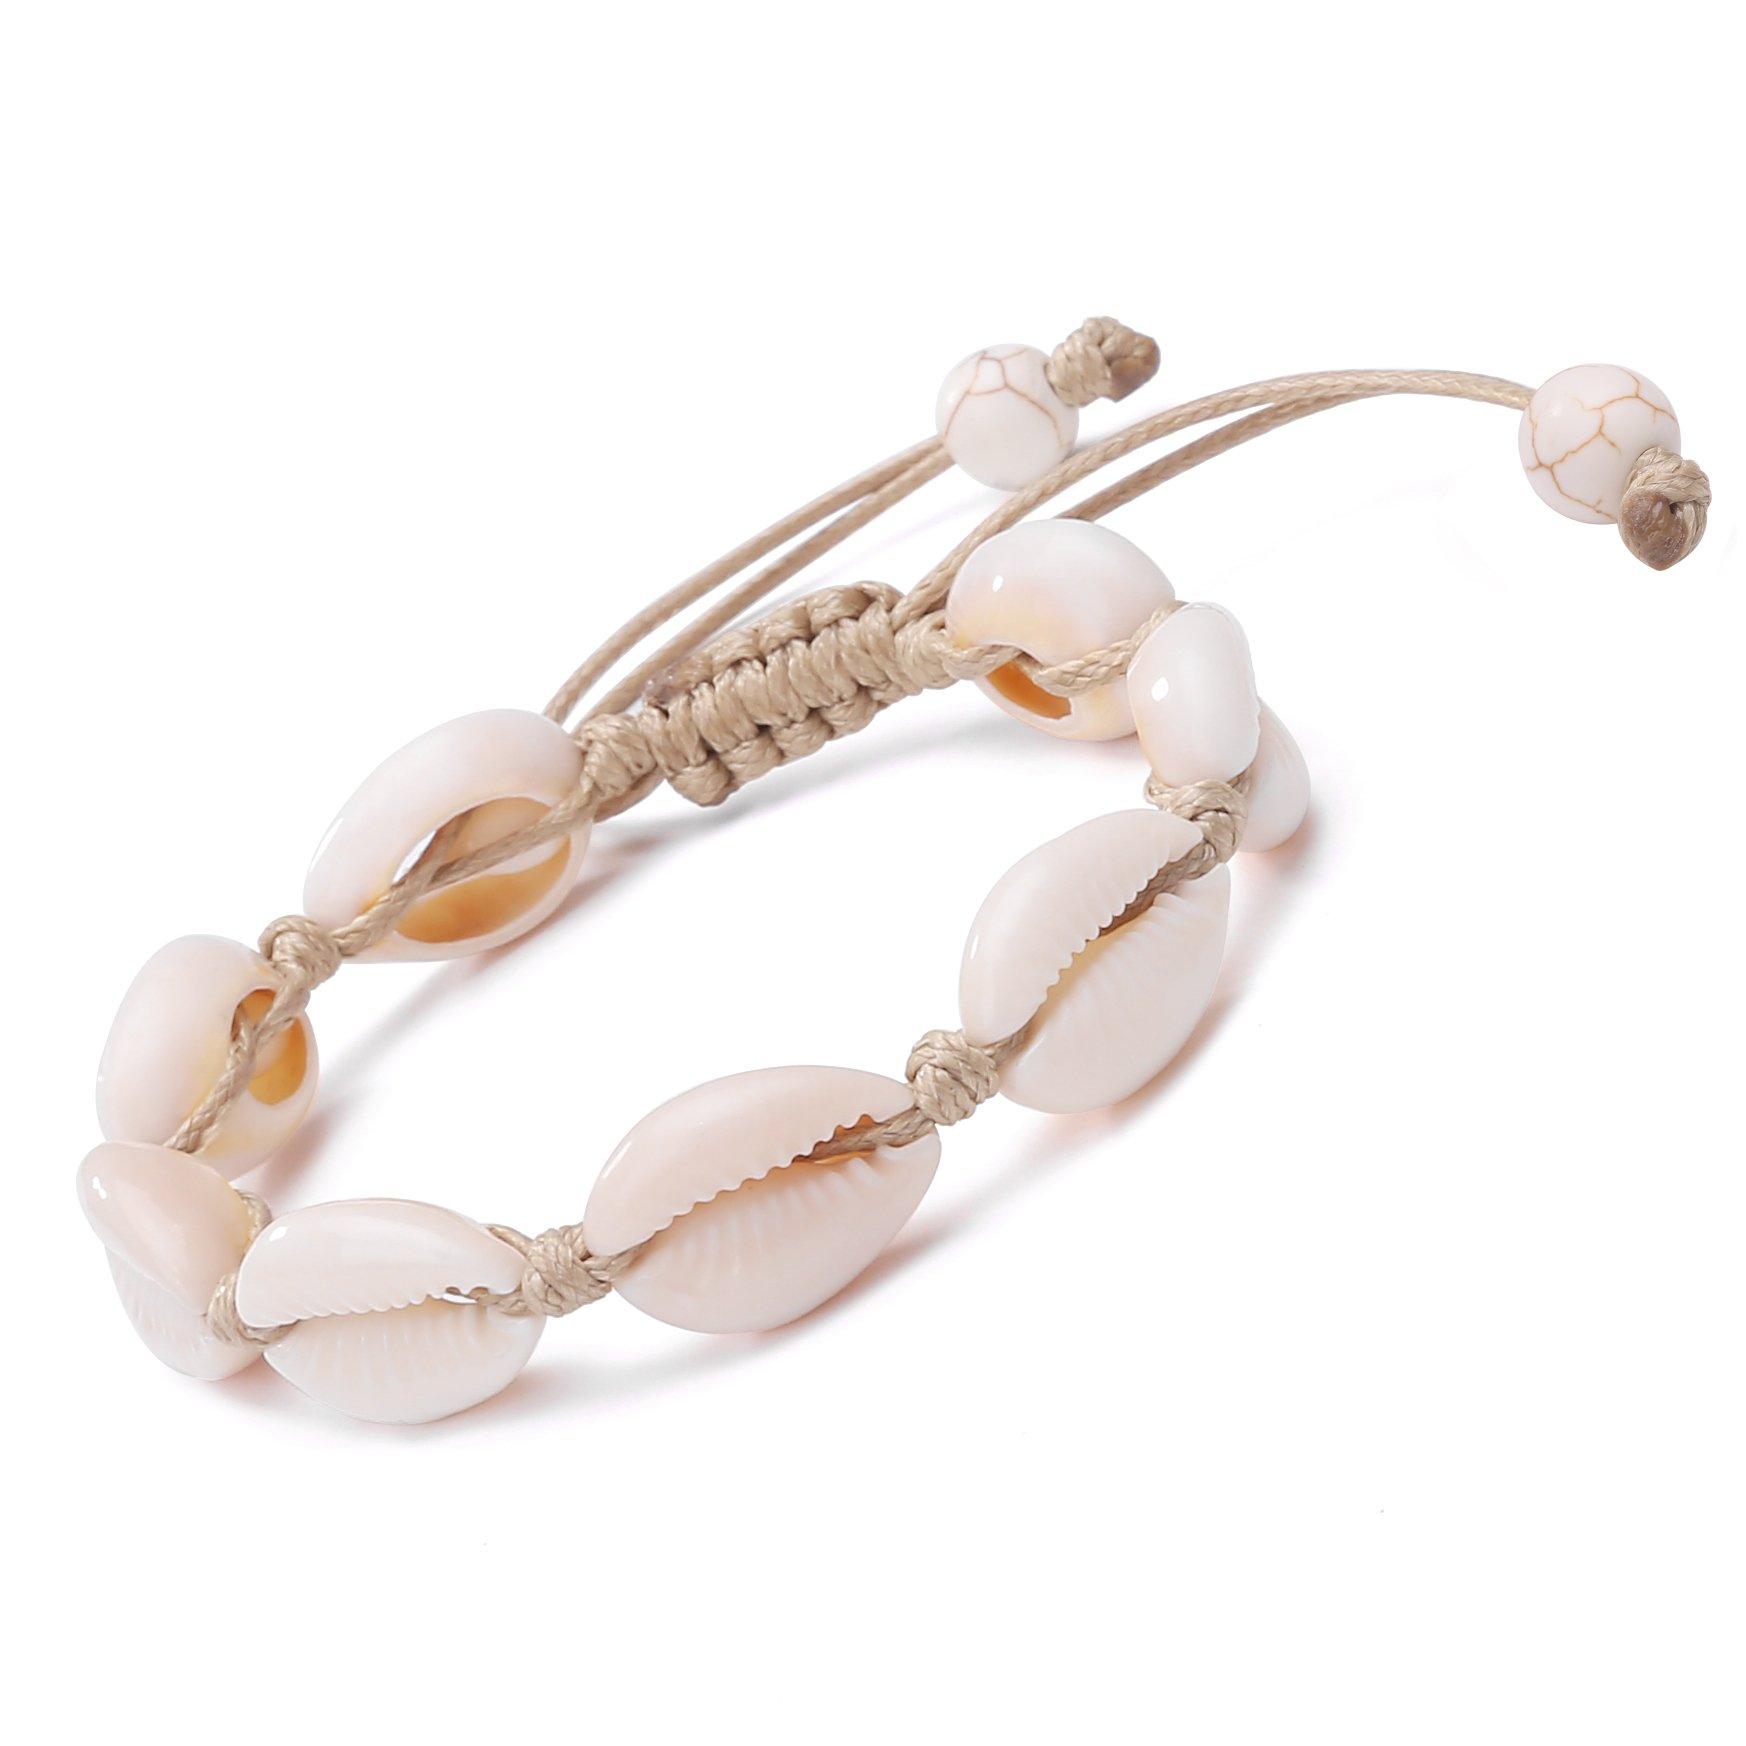 POTESSA Natural Cowrie Bead Shell Bracelet Hawaiian Jamaican Style Adjustable Beach Surfer Jewelry Macrame Bracelets for Women Girls